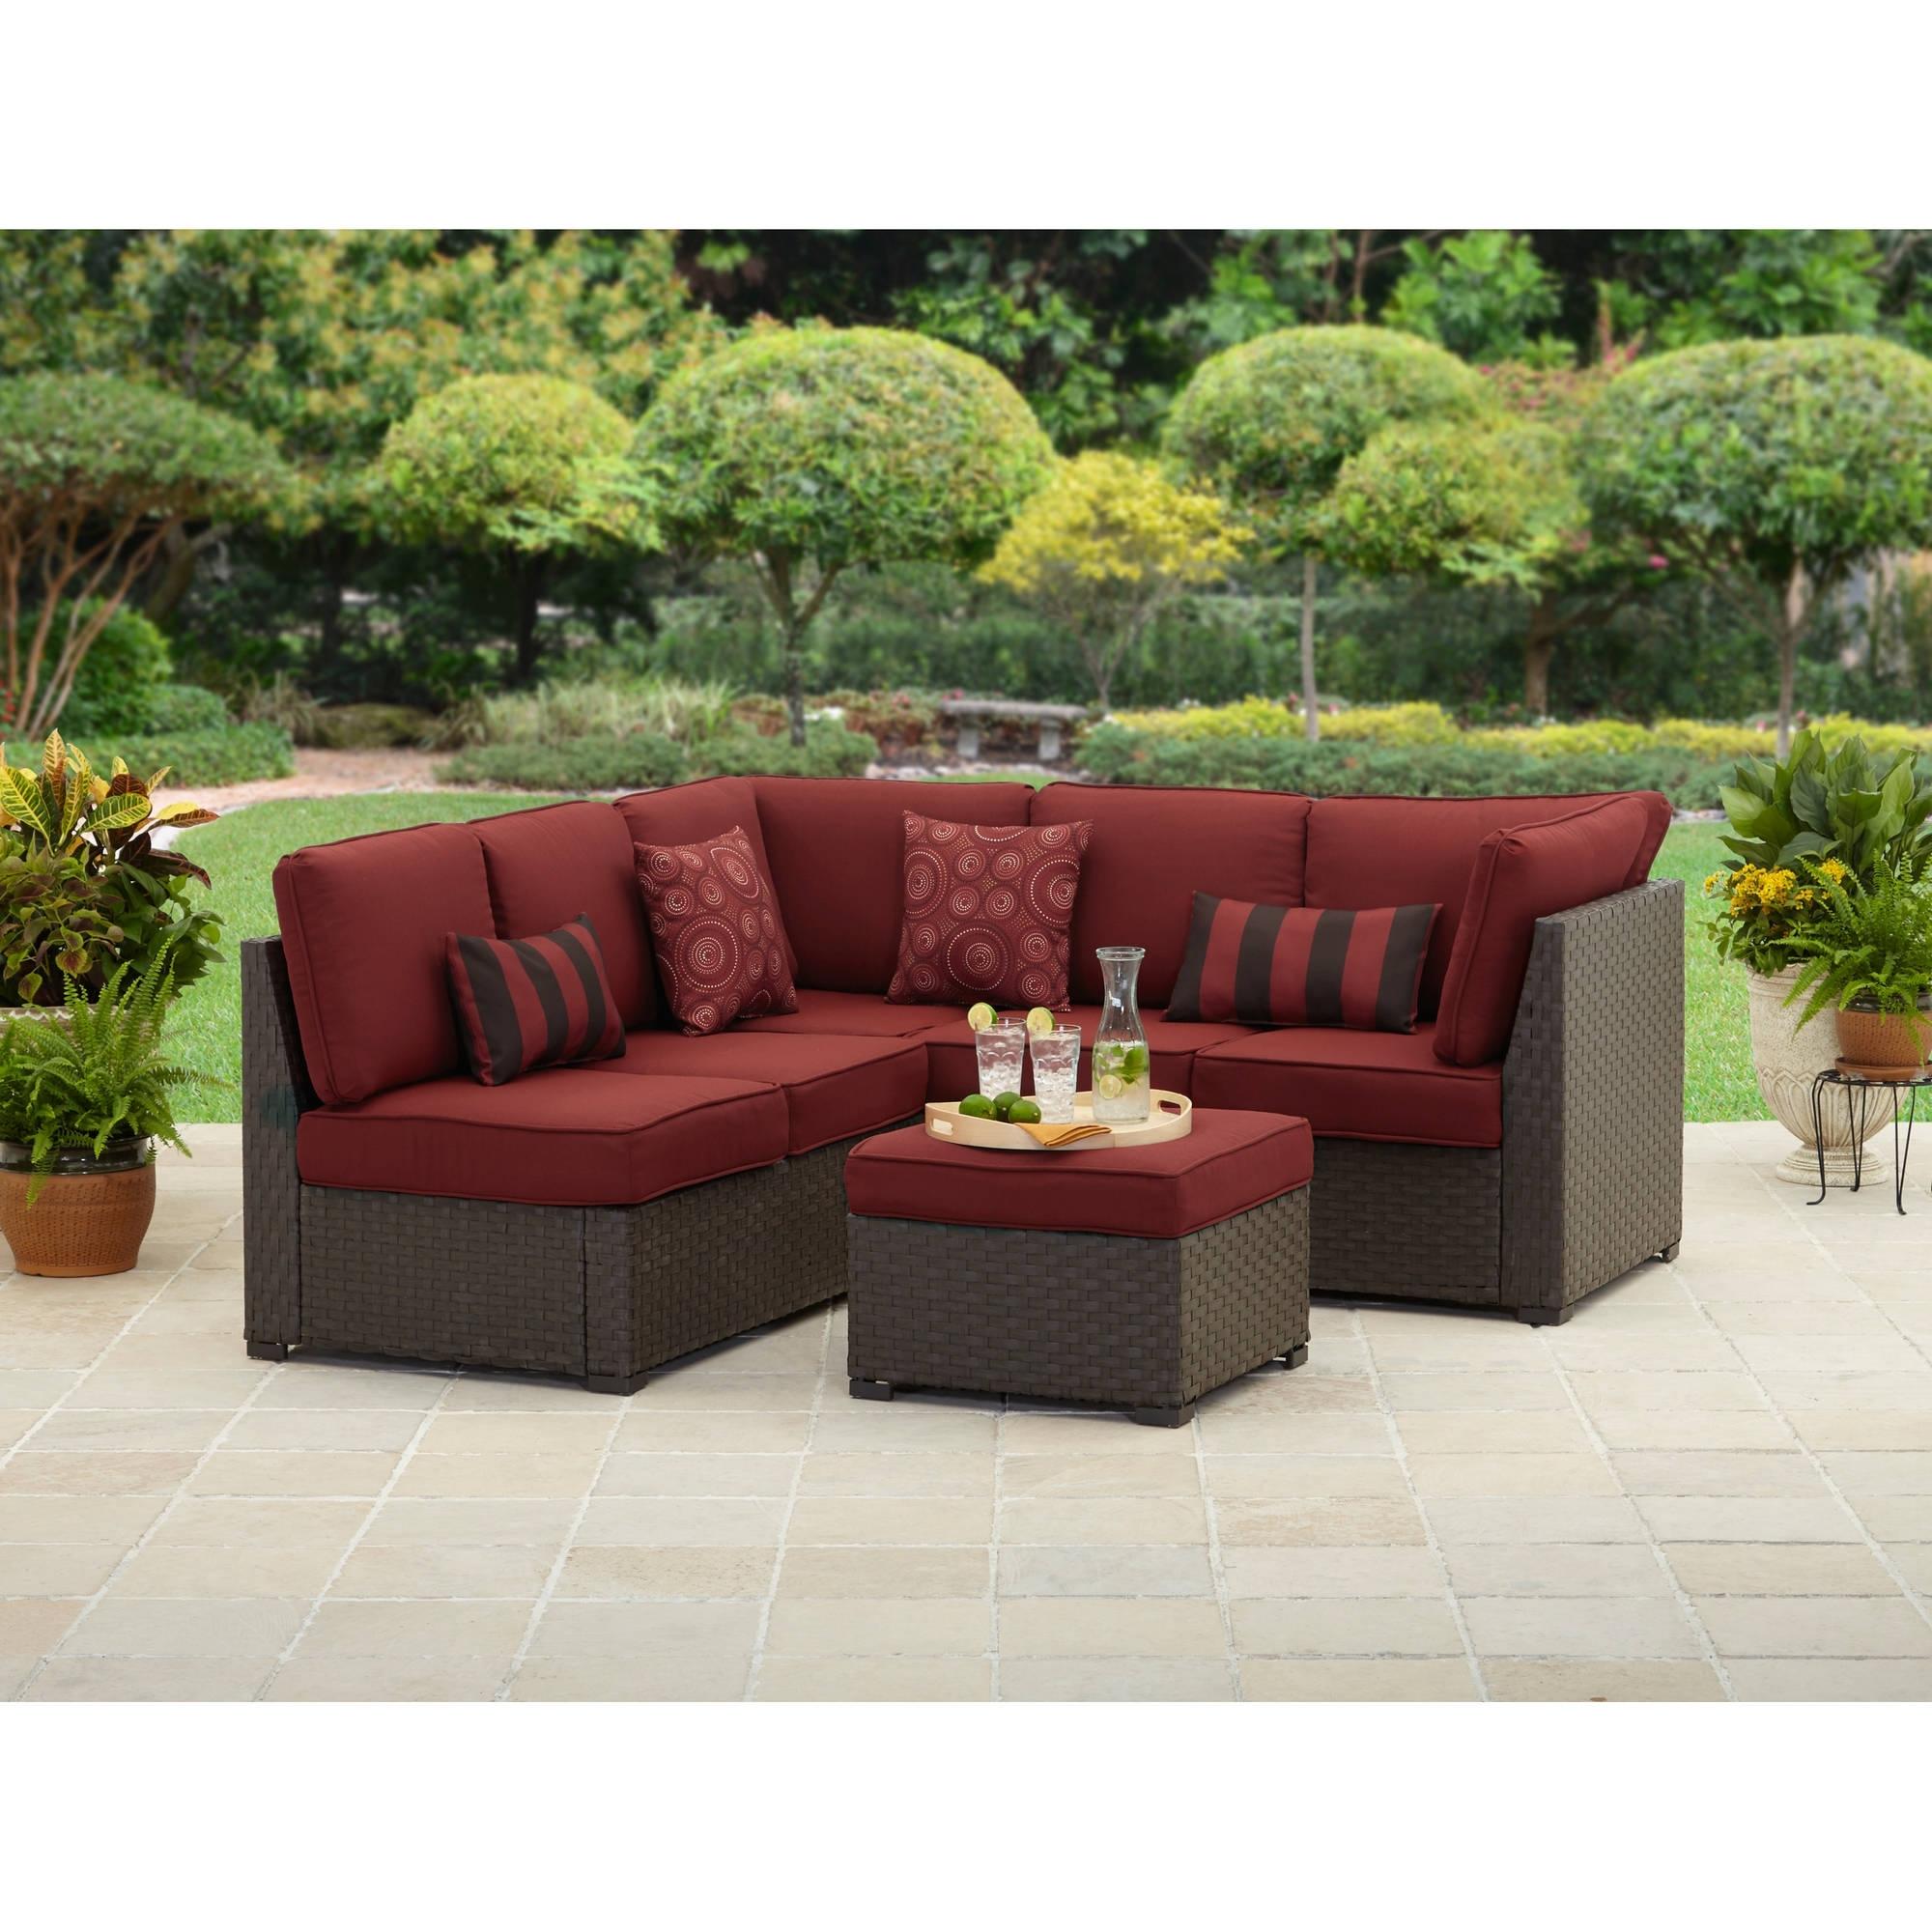 Popular Target Patio Furniture Conversation Sets Inside Patio Conversation Sets Clearance Patio Conversation Sets Under  (View 6 of 15)